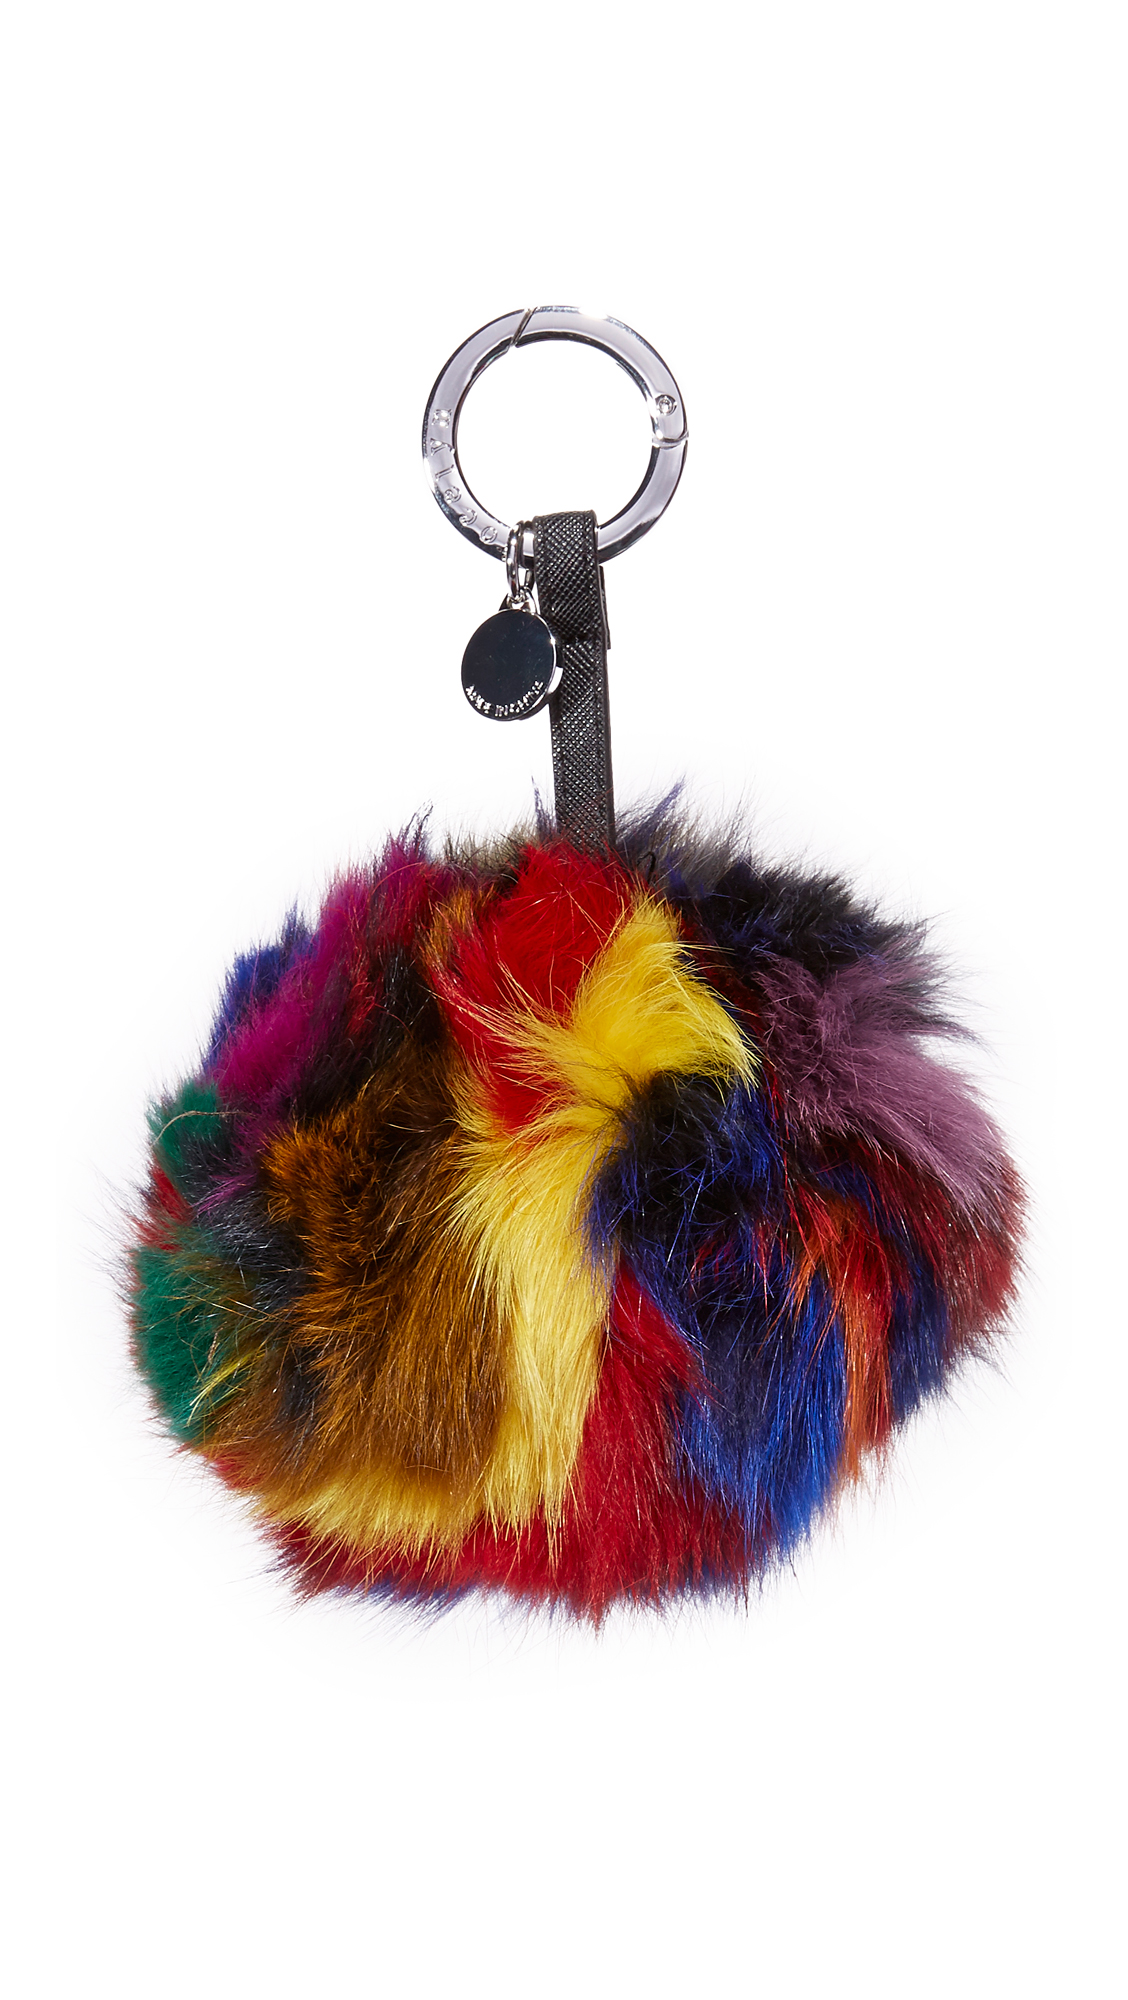 jocelyn female jocelyn super swirl fur leather bag charm dark multi